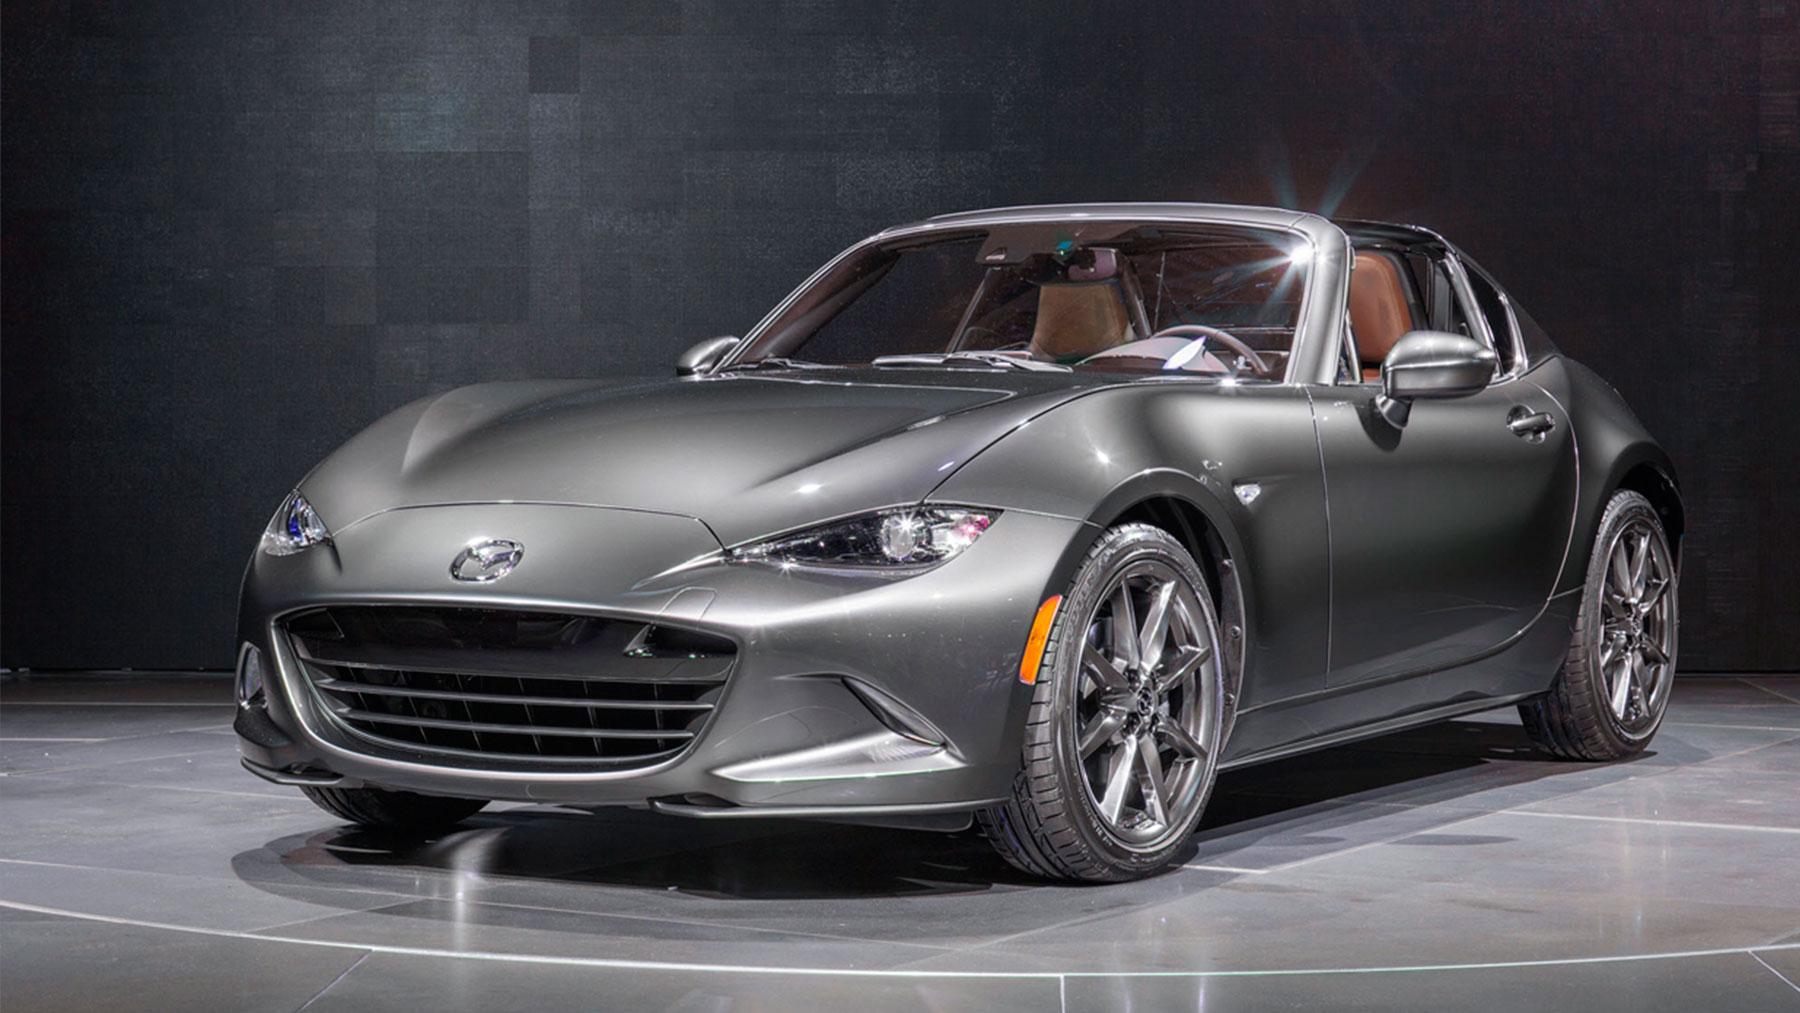 Mazda Tribute Ford Maverick View Topic Testing Door Ajar Switch